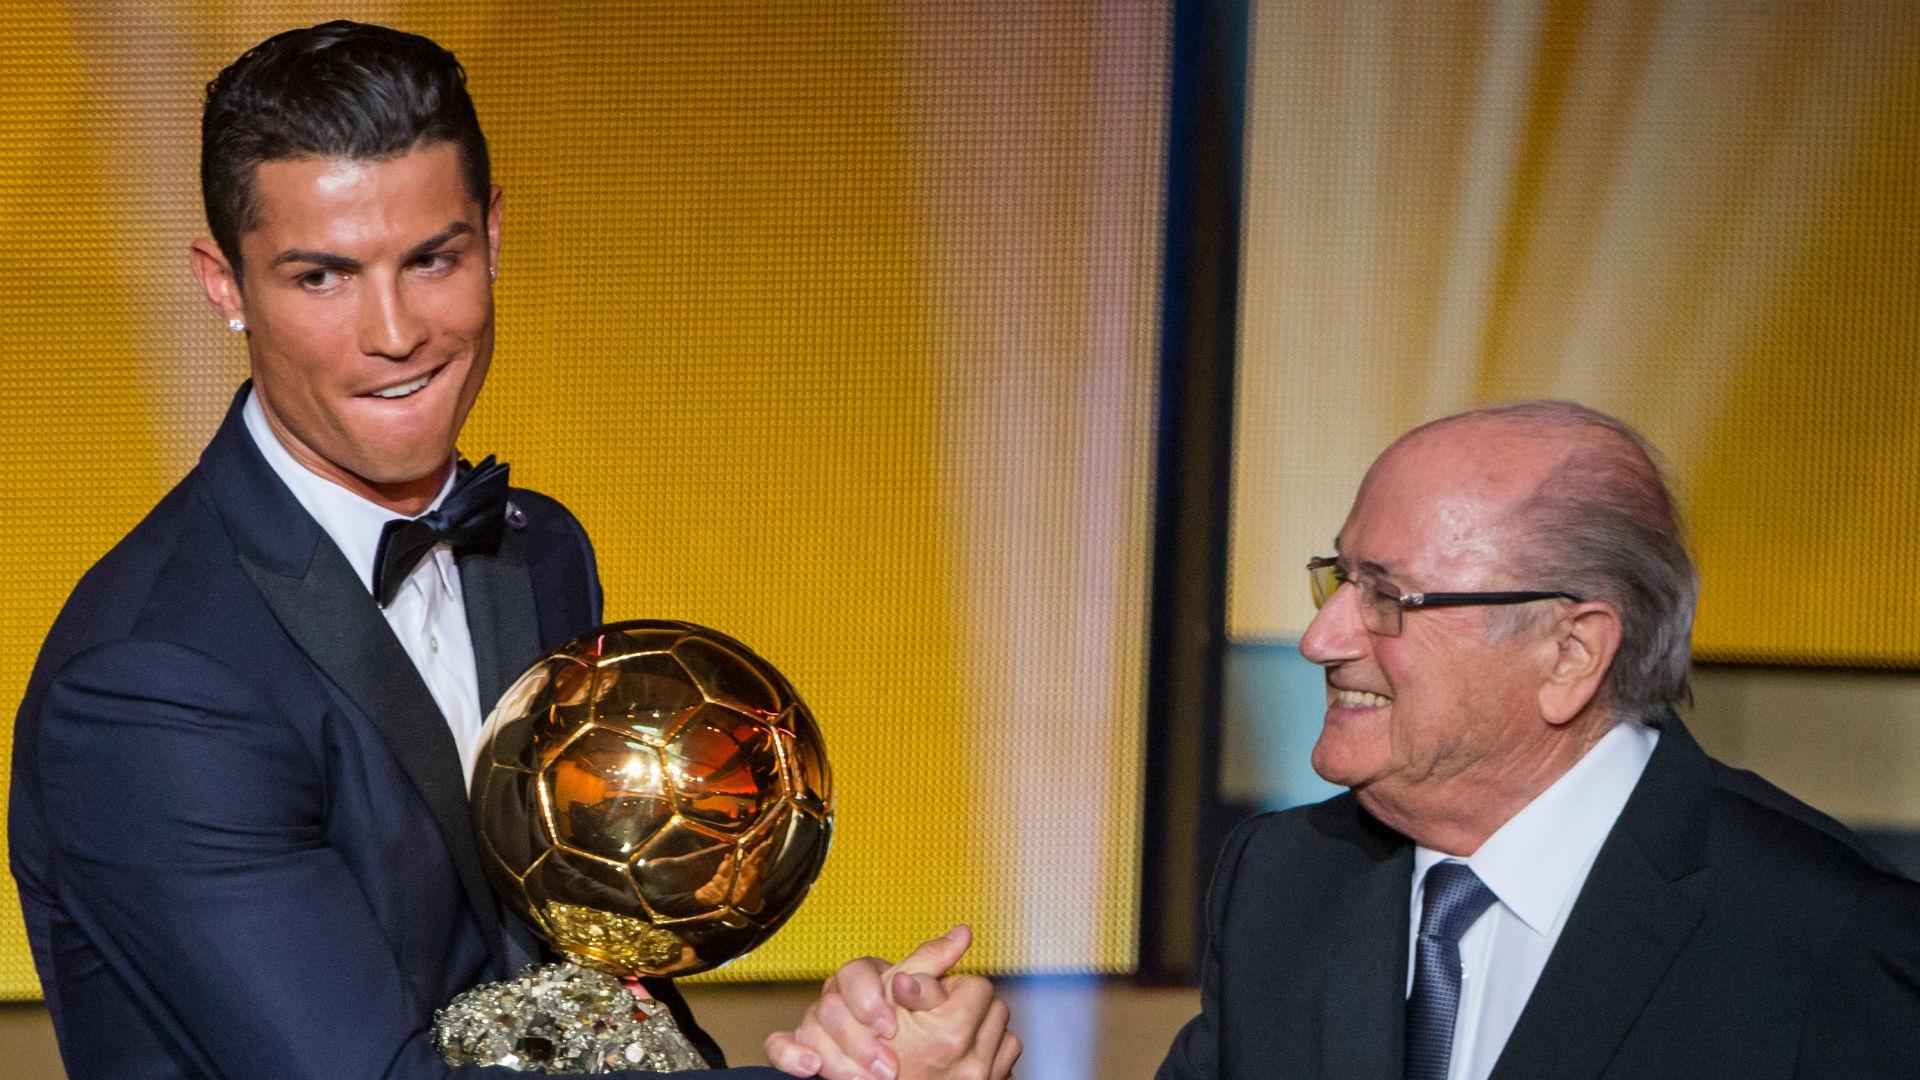 Sepp Blatter and Cristiano Ronaldo